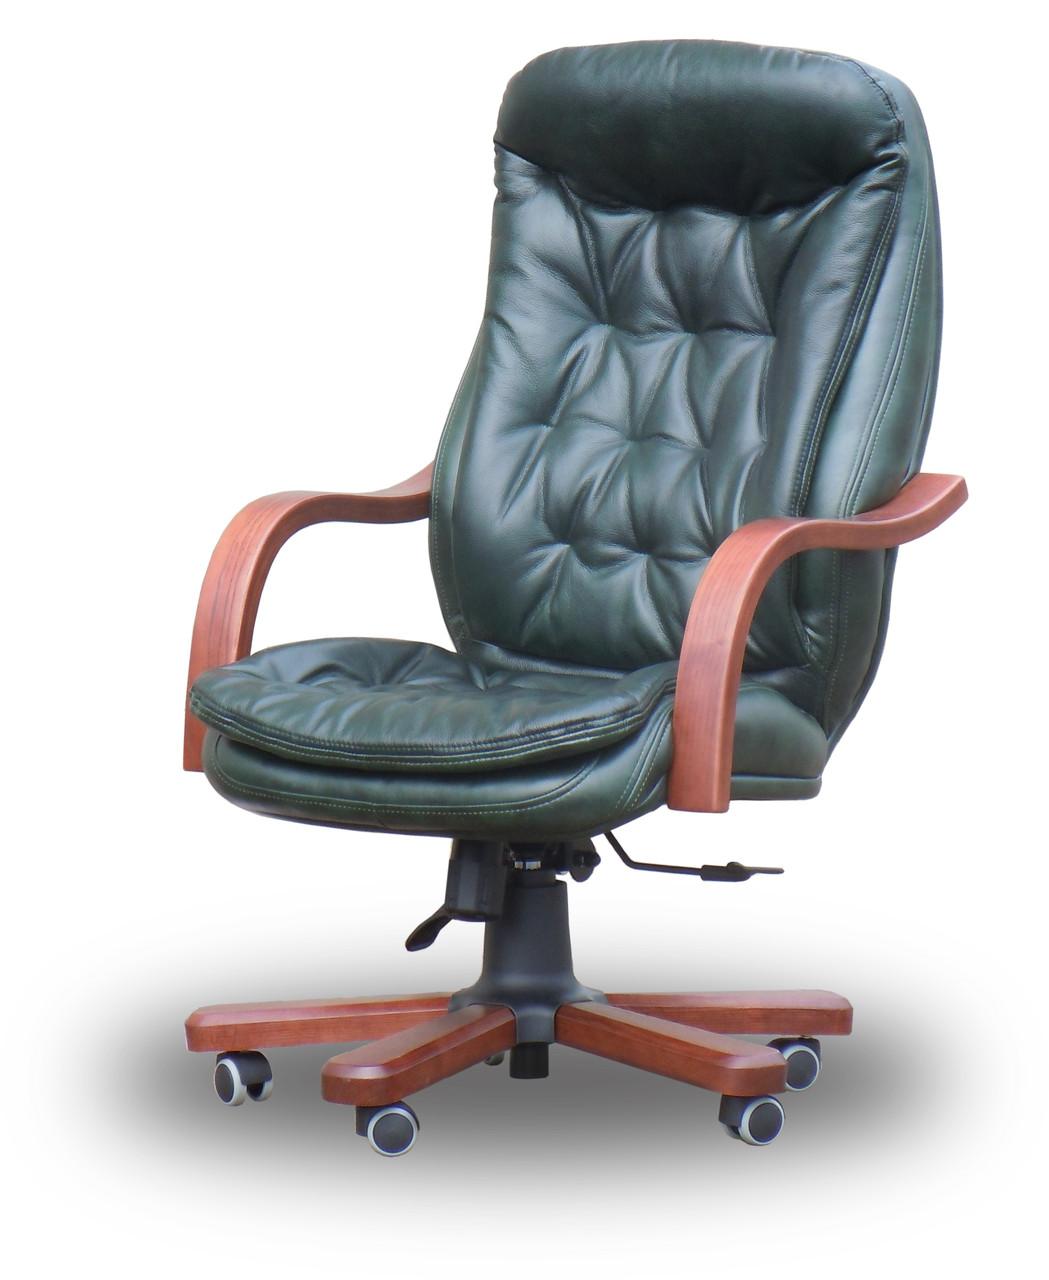 Кресло руководителя Венеция Wood HB кожзам / кожа